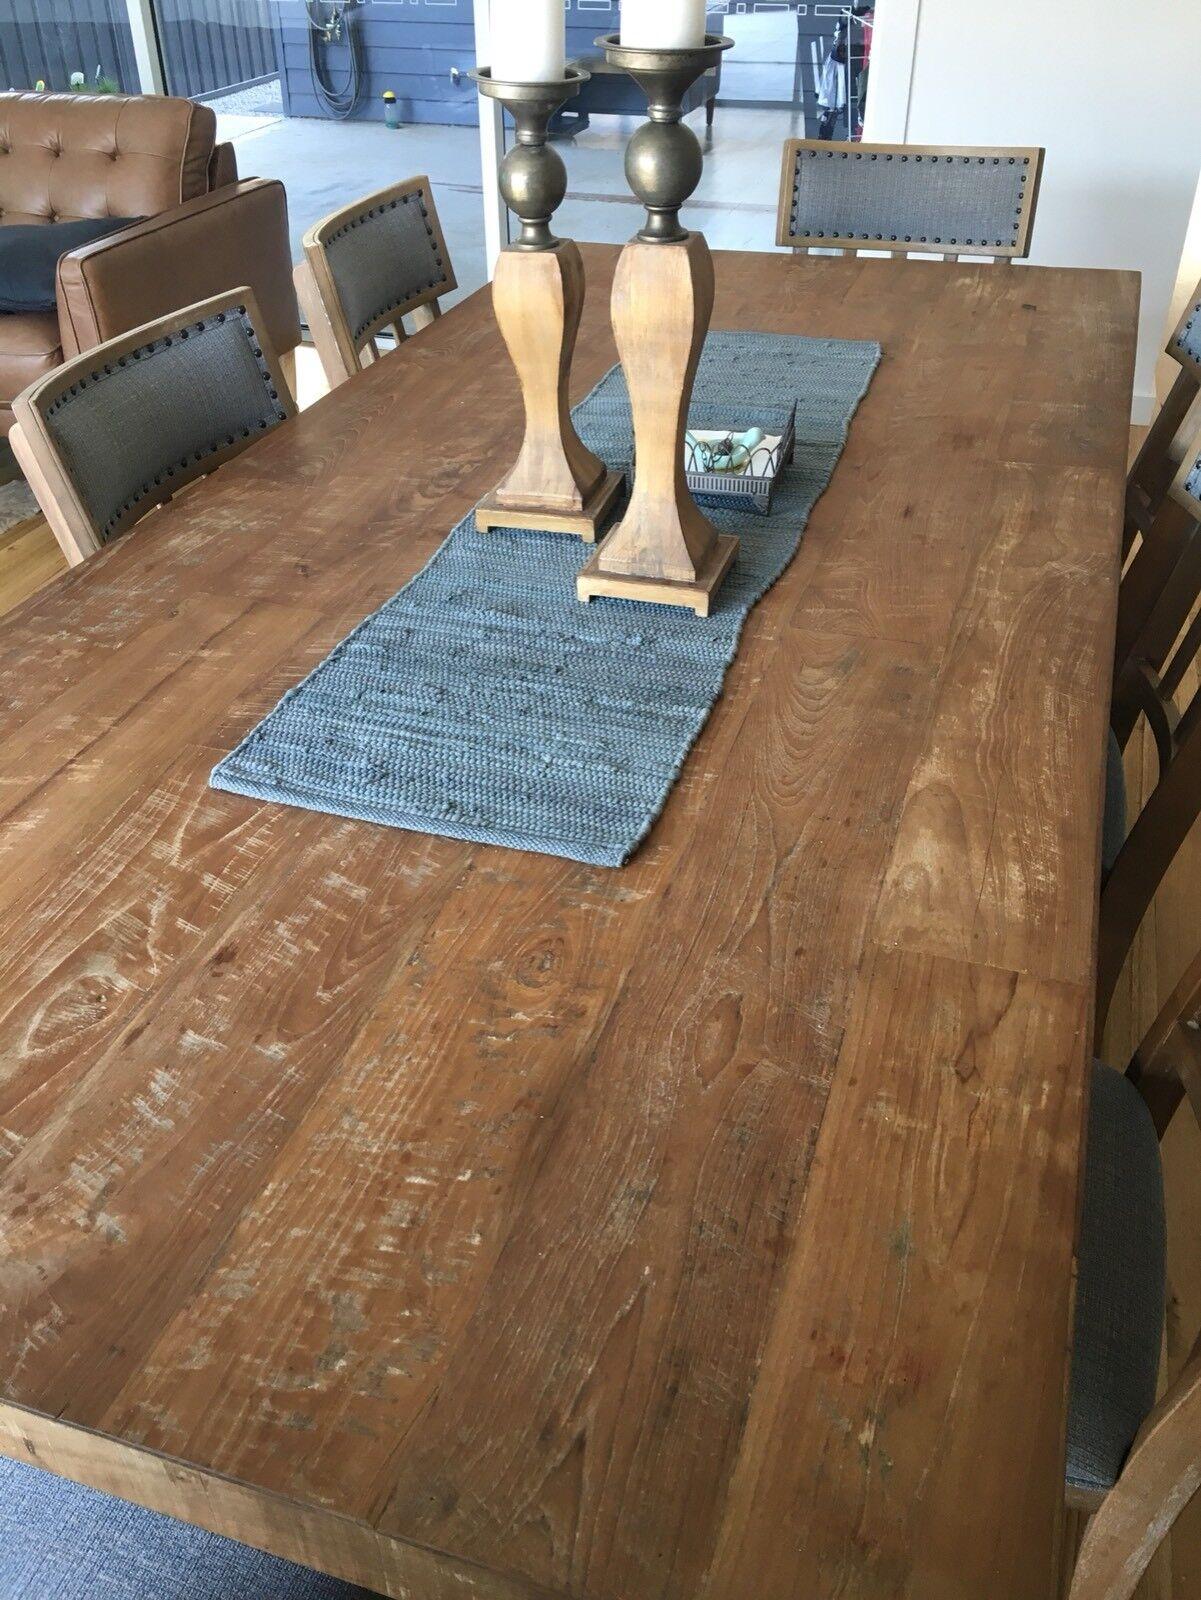 Industrial coffee table coffee tables gumtree australia wollongong area horsley 1208340435